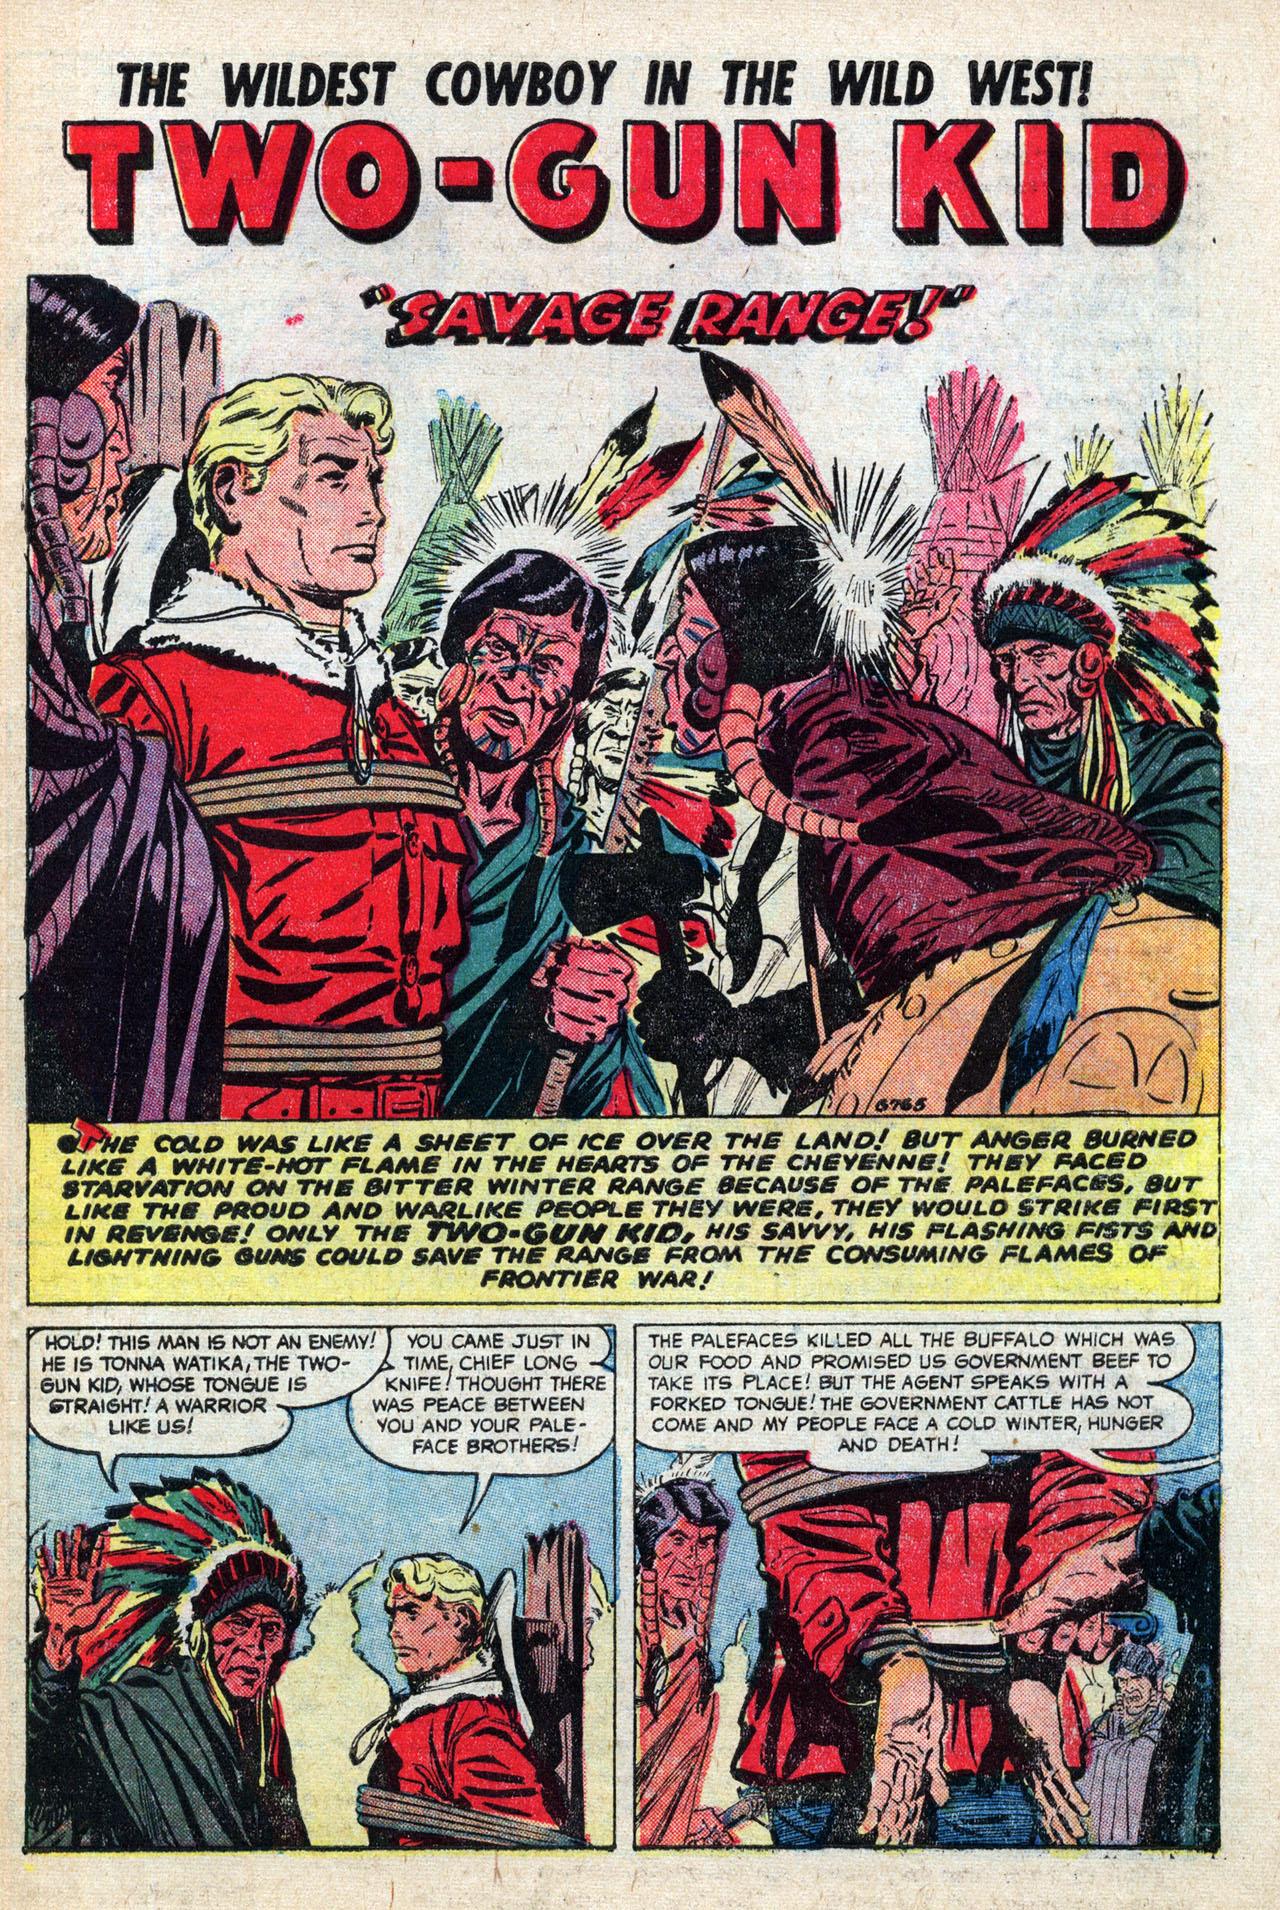 Read online Two-Gun Kid comic -  Issue #27 - 27